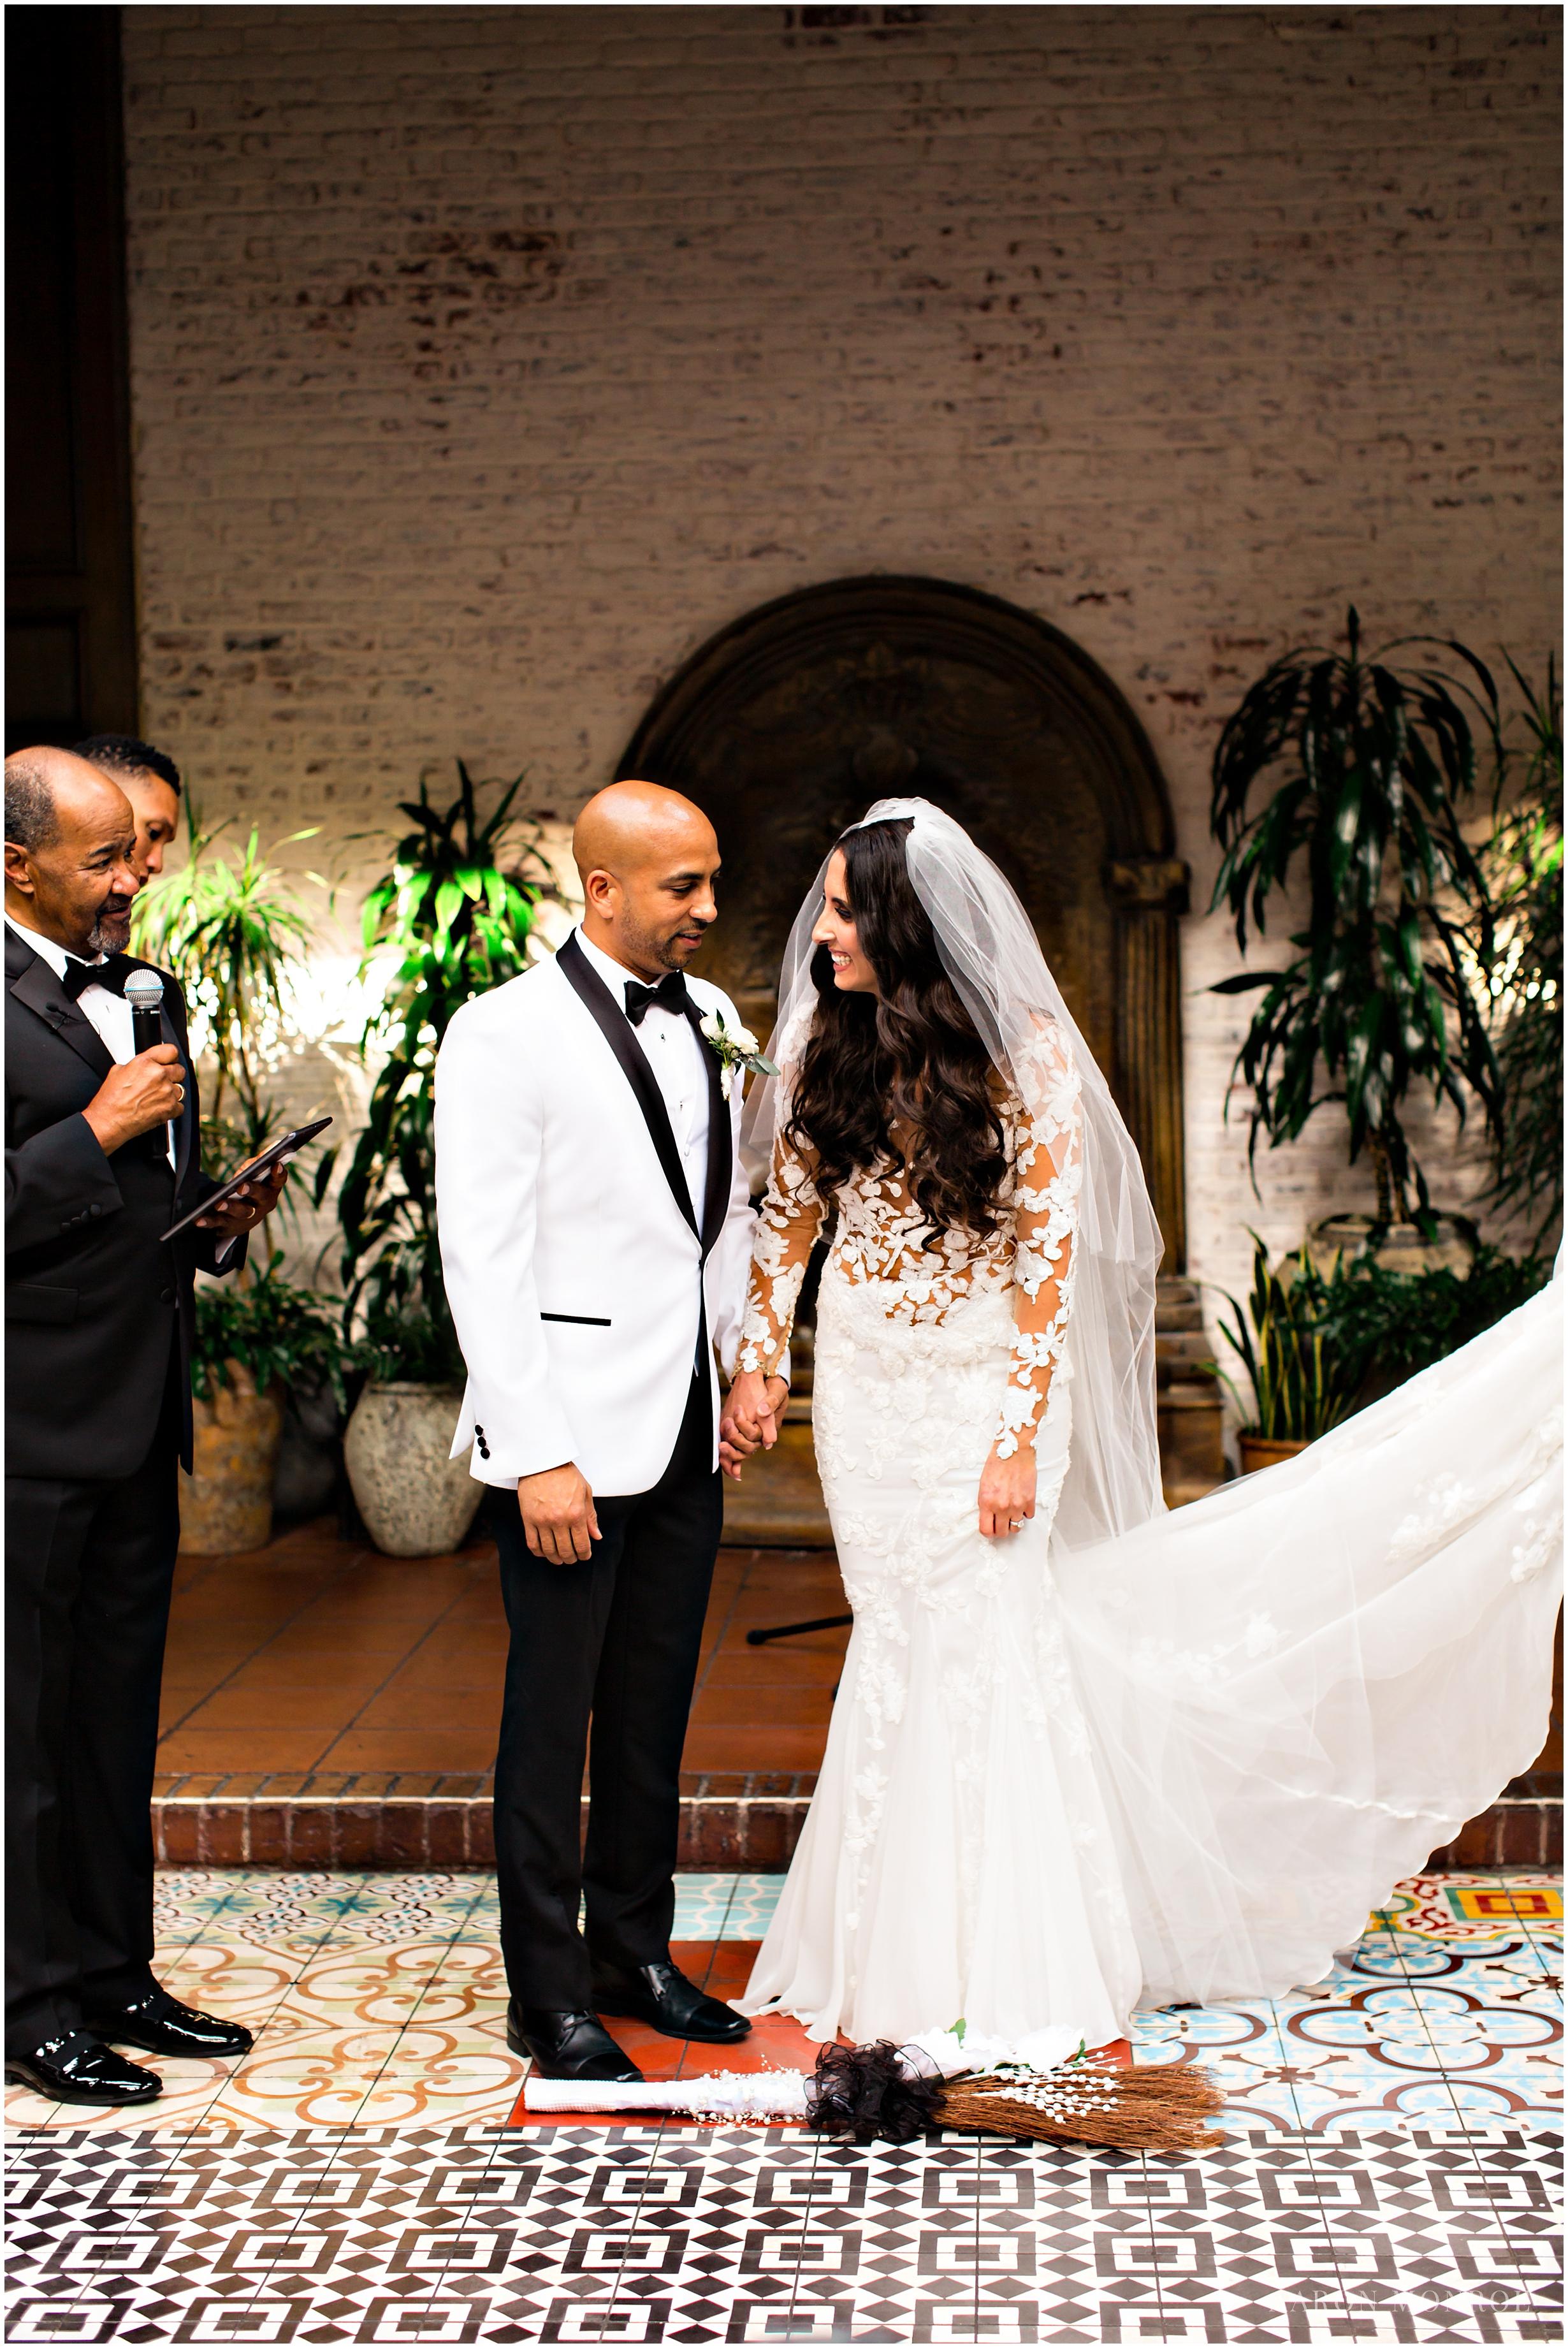 Ebell_Long_Beach_Wedding_Photography_0840.jpg